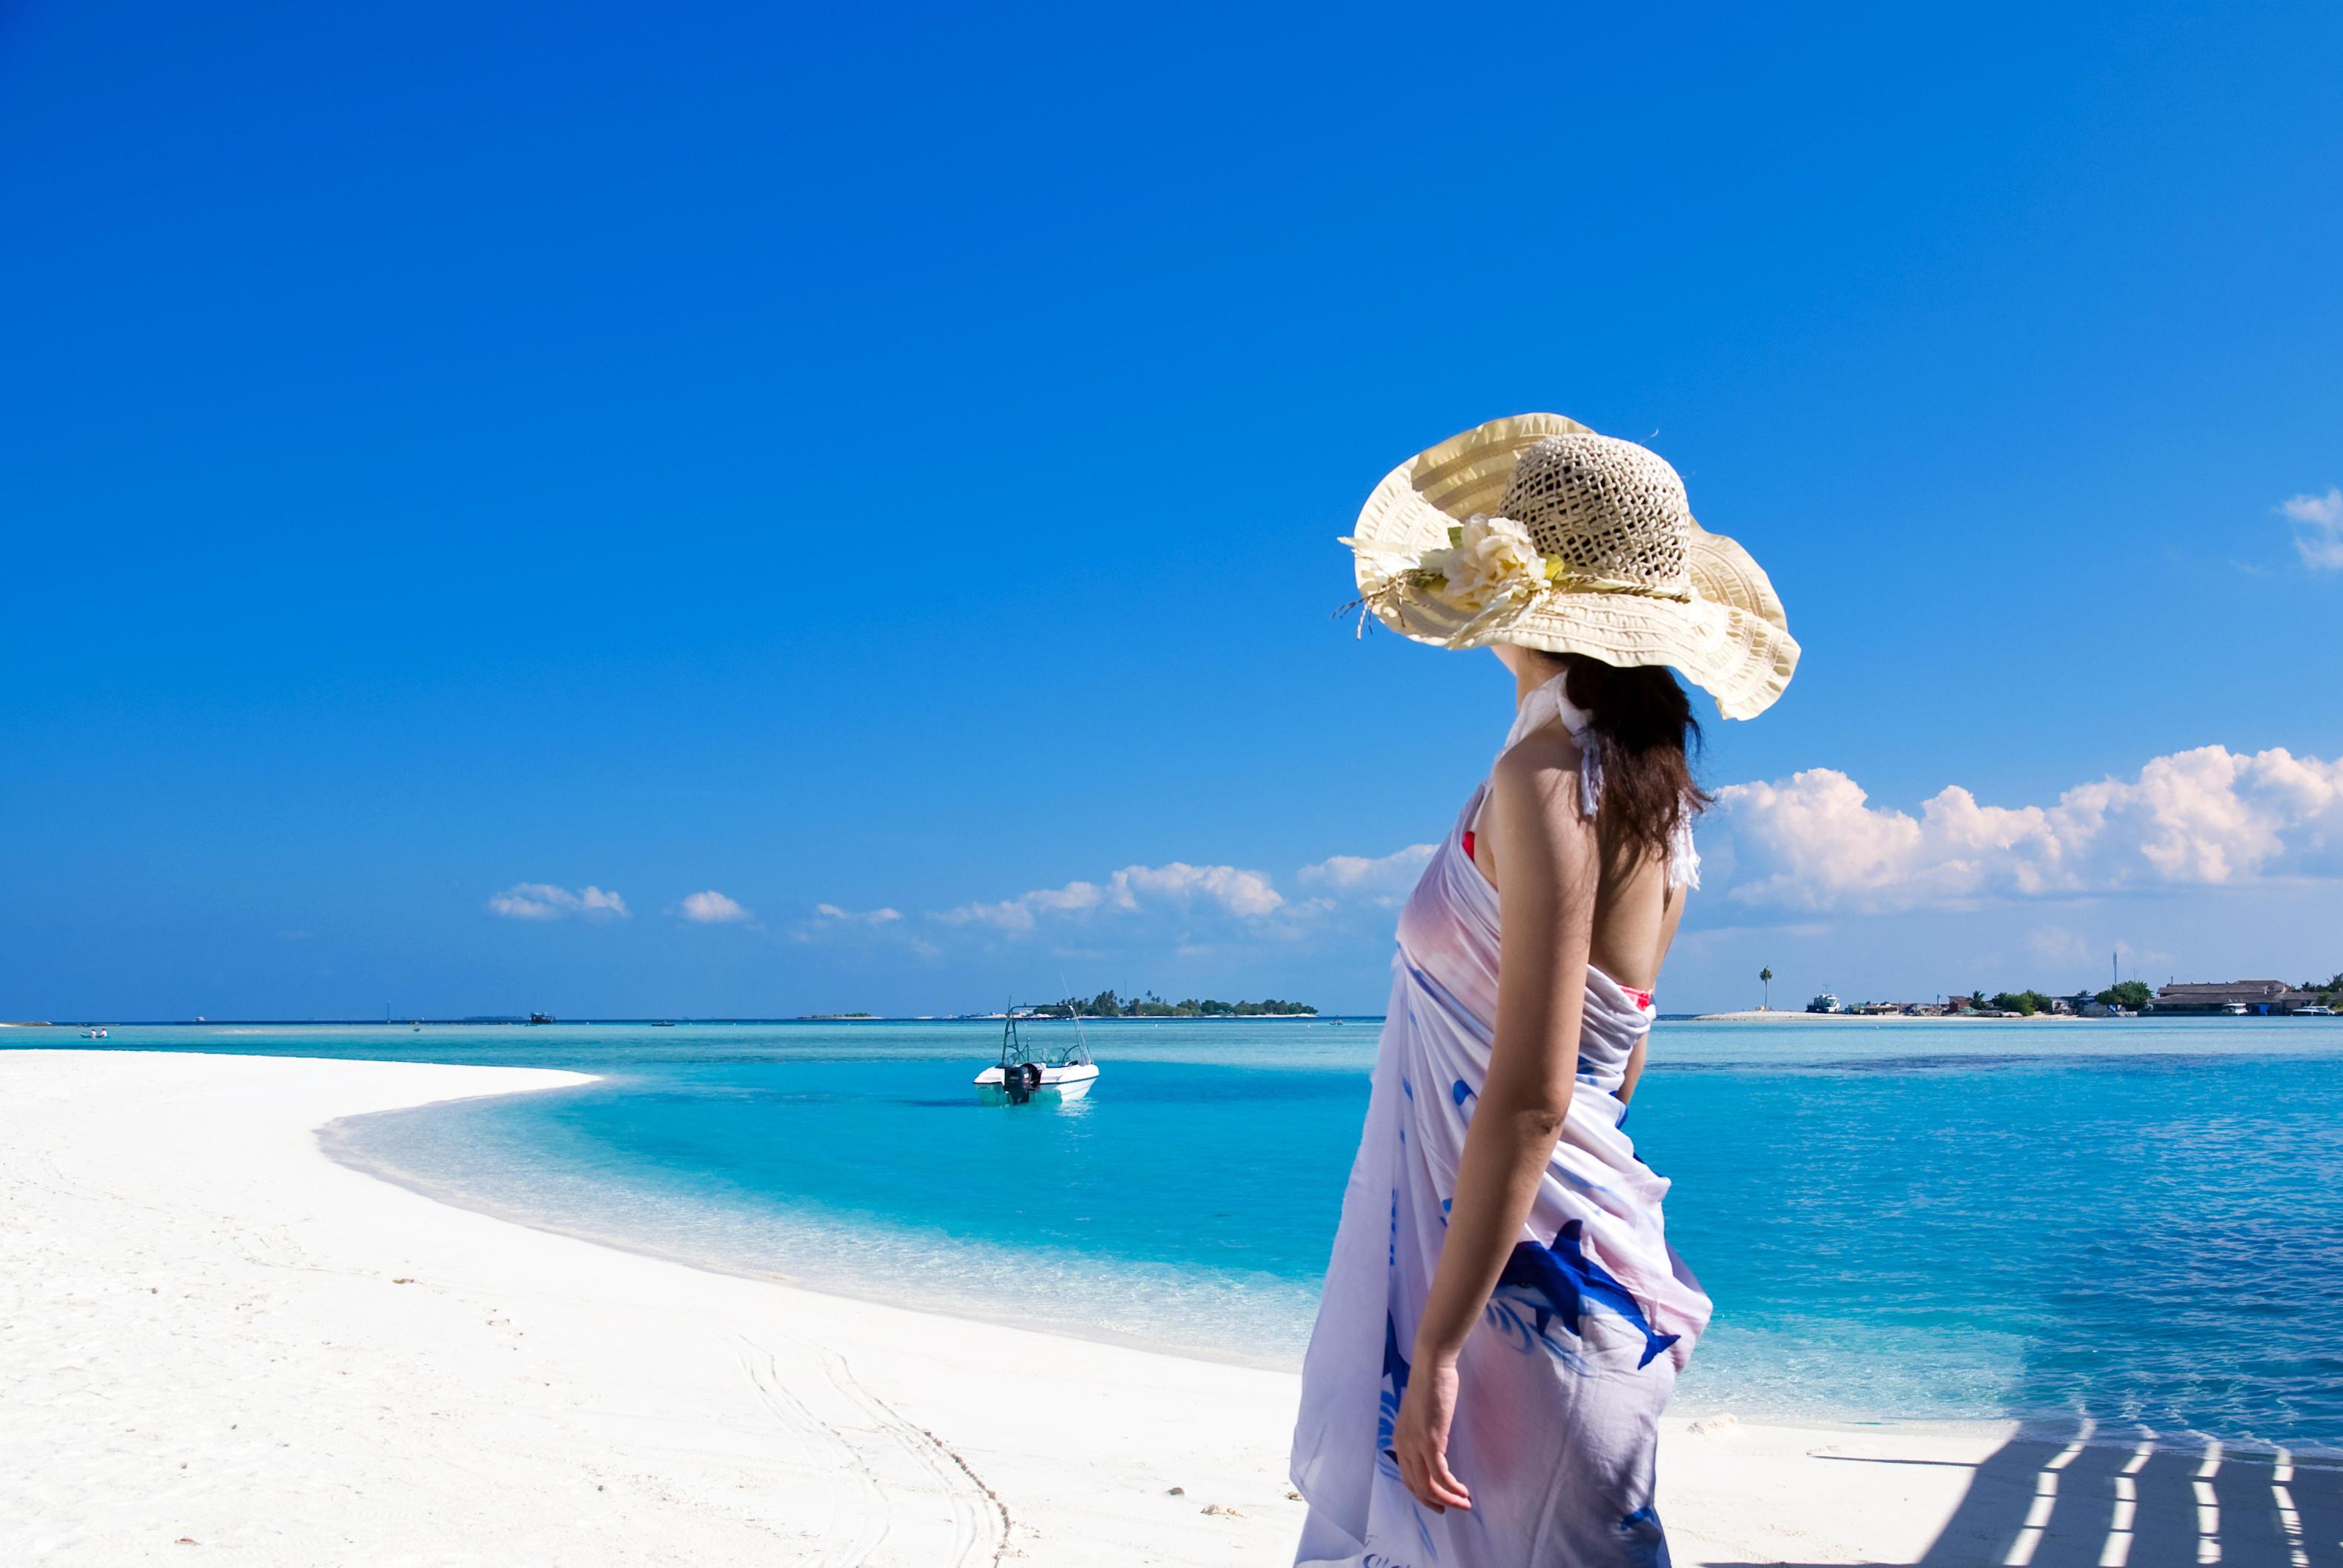 Эротические девушки обои по теме девушки на пляже дружно